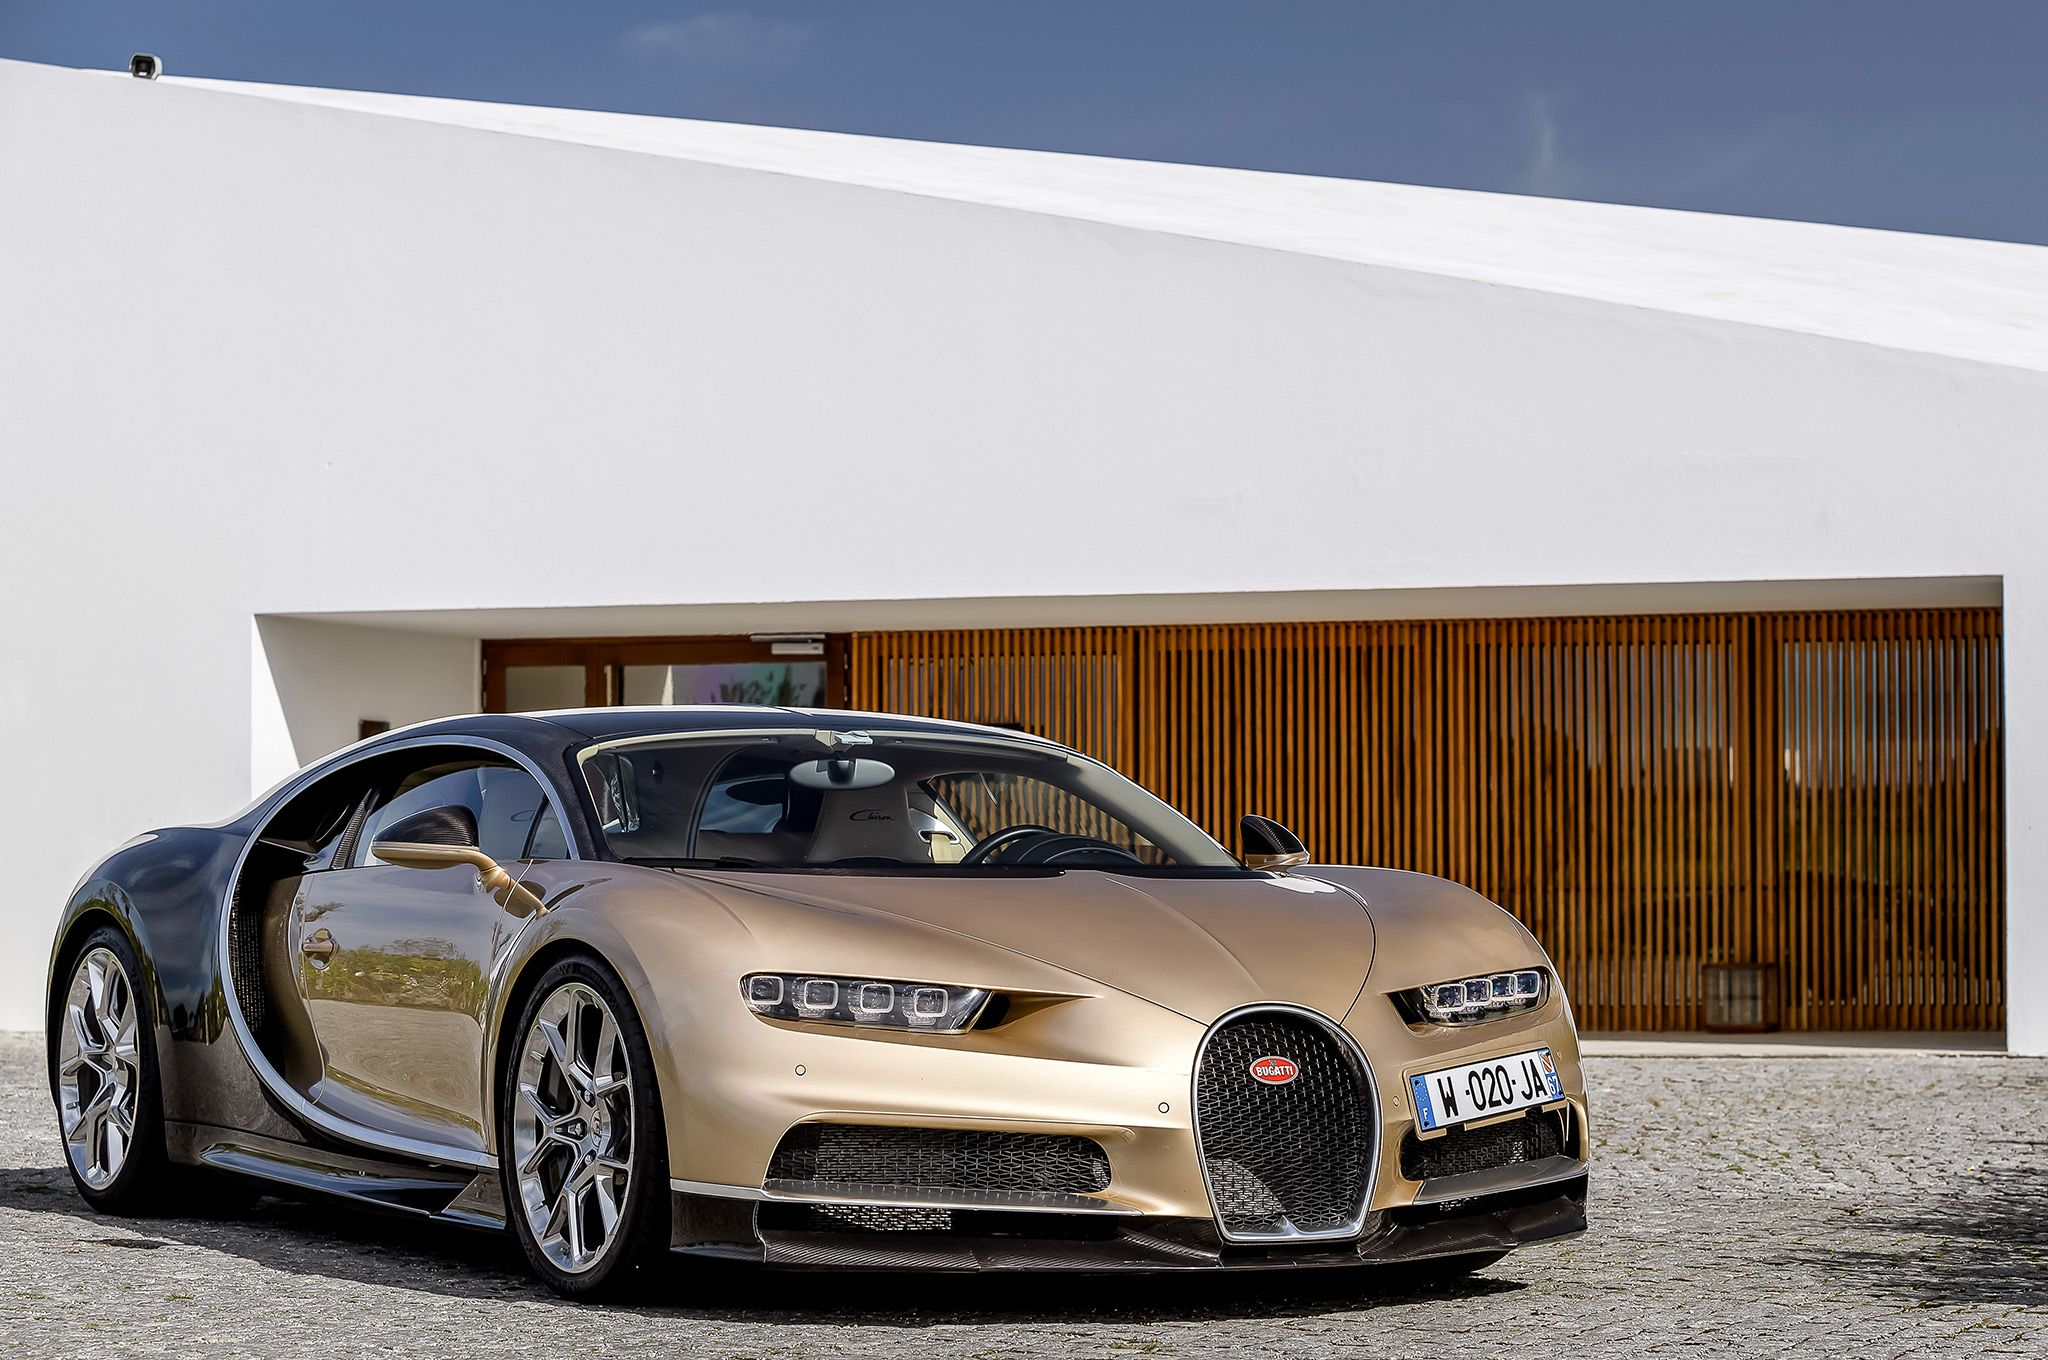 2018 Bugatti Chiron Gold 092 1 | Dream Car Garage | Bugatti